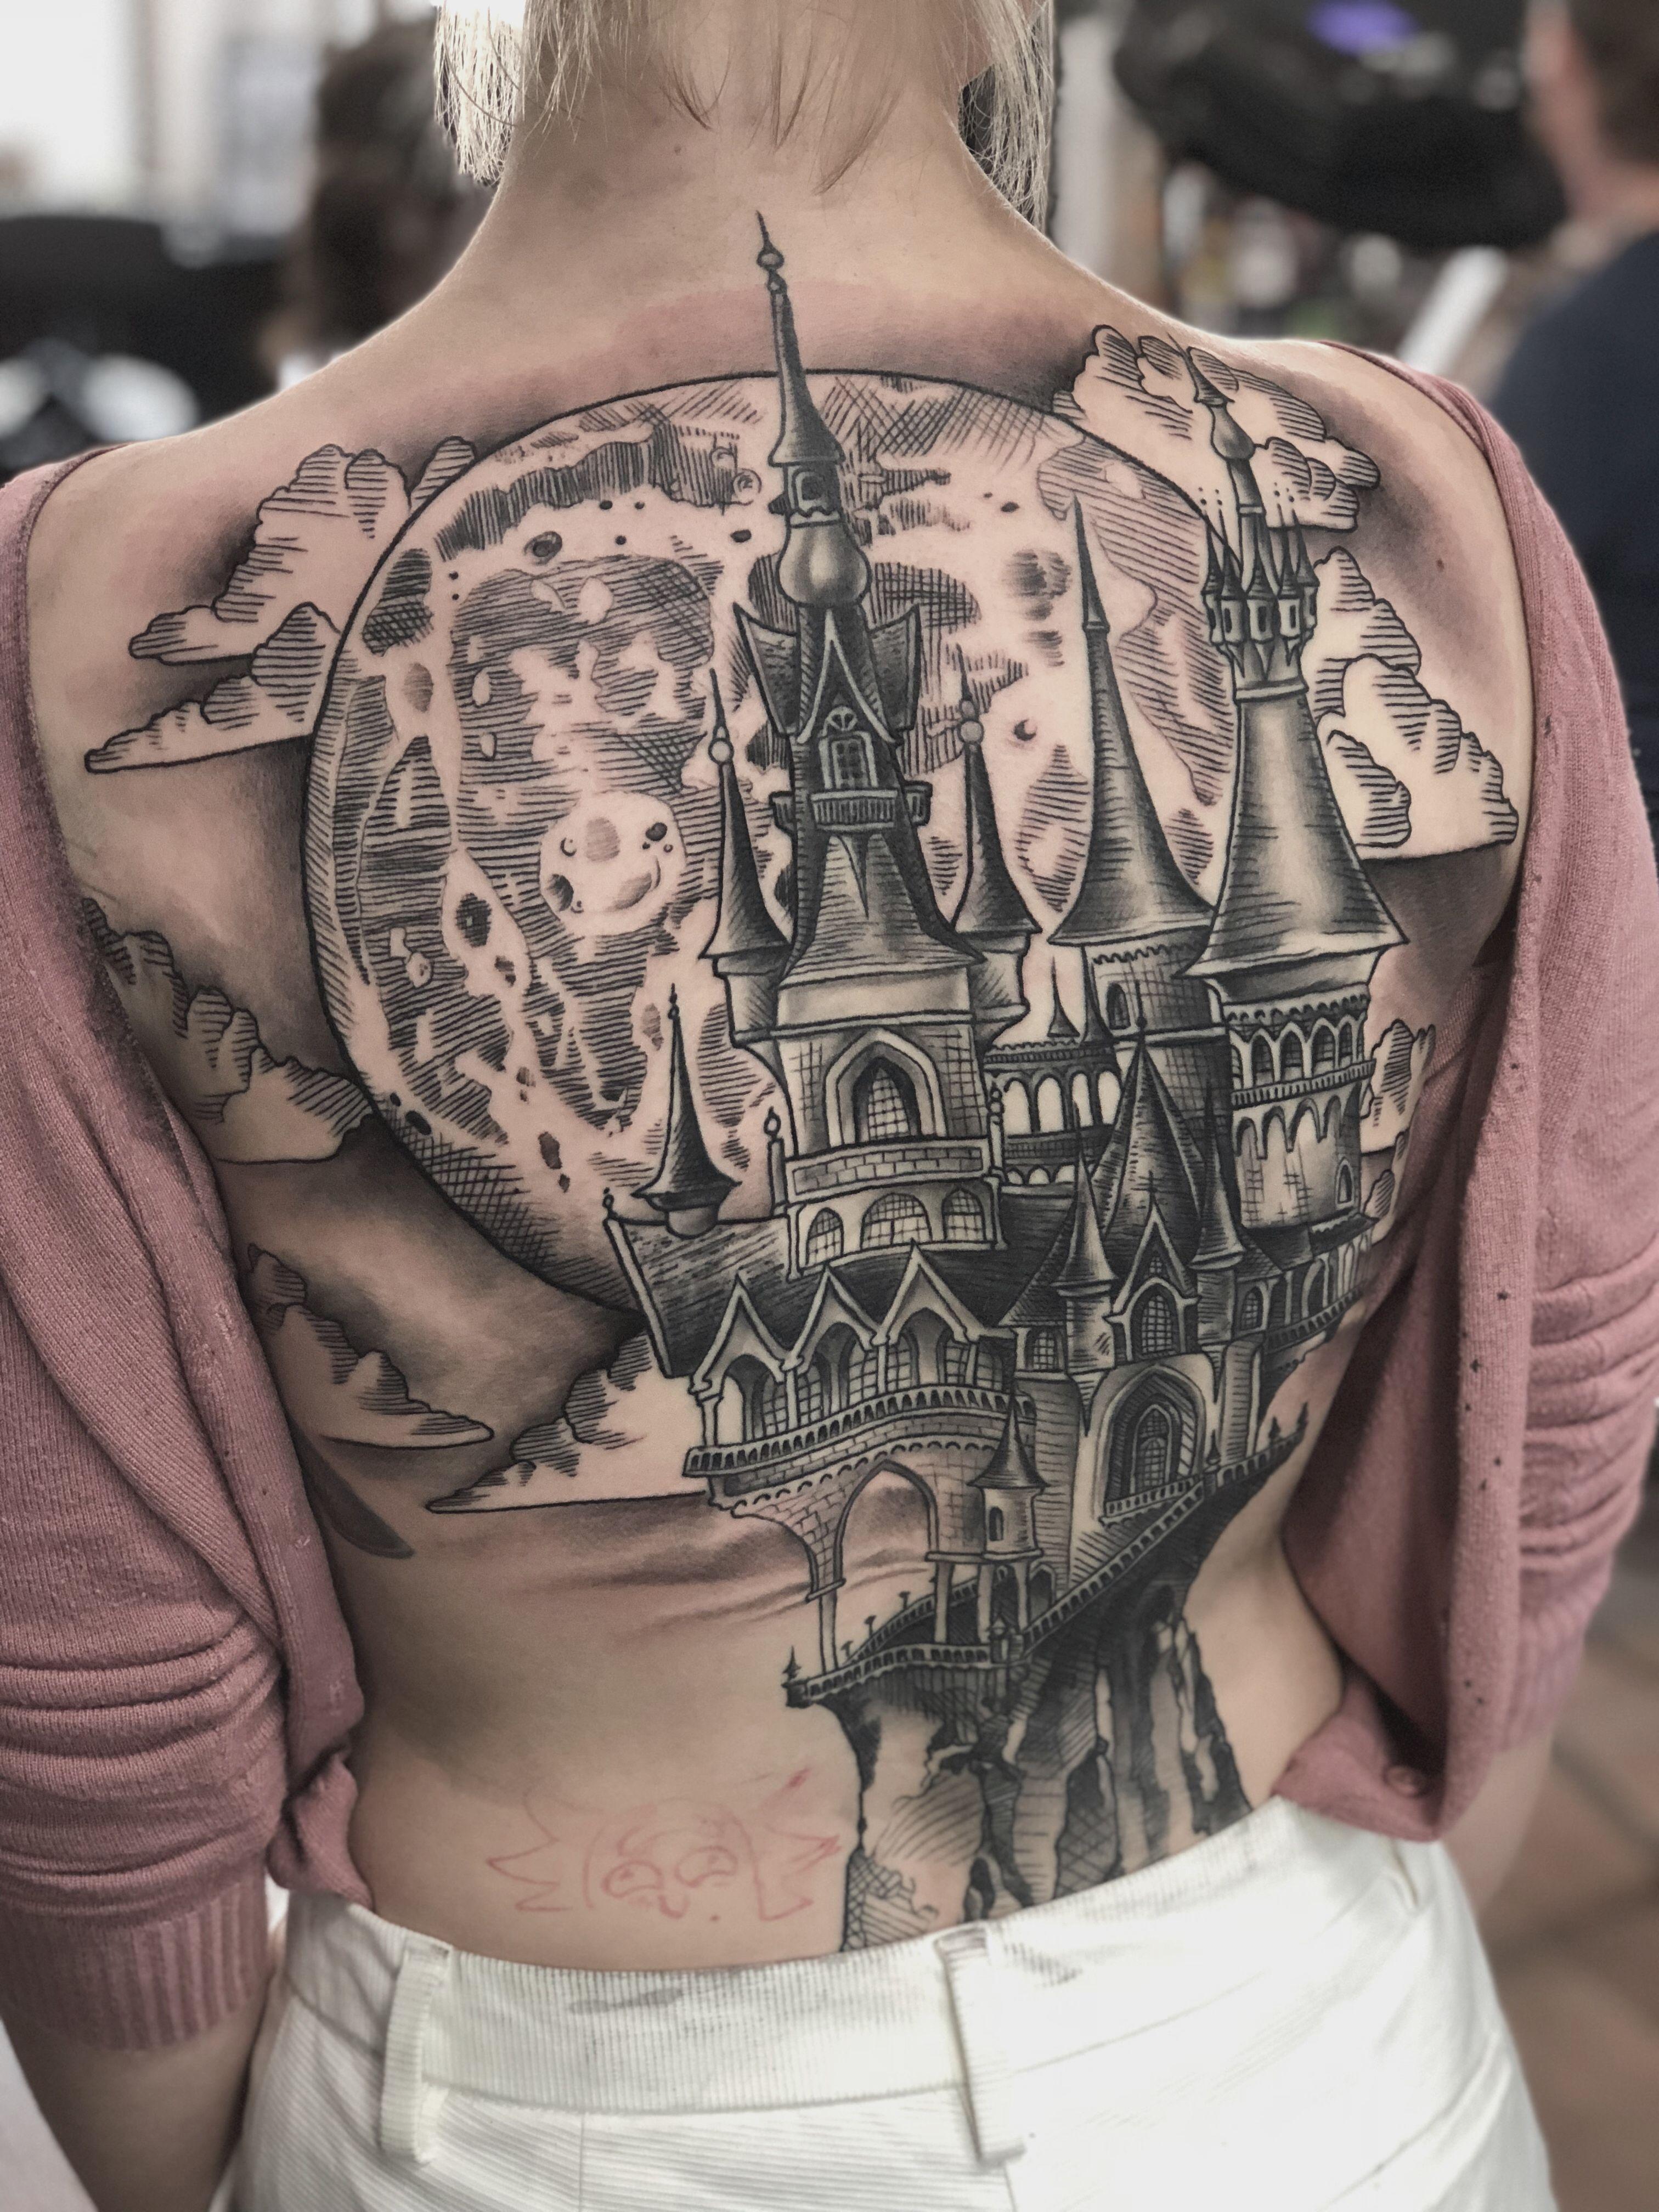 Tattoo ideas back piece castle line art blackwork backpiece by royal ink nick limpens